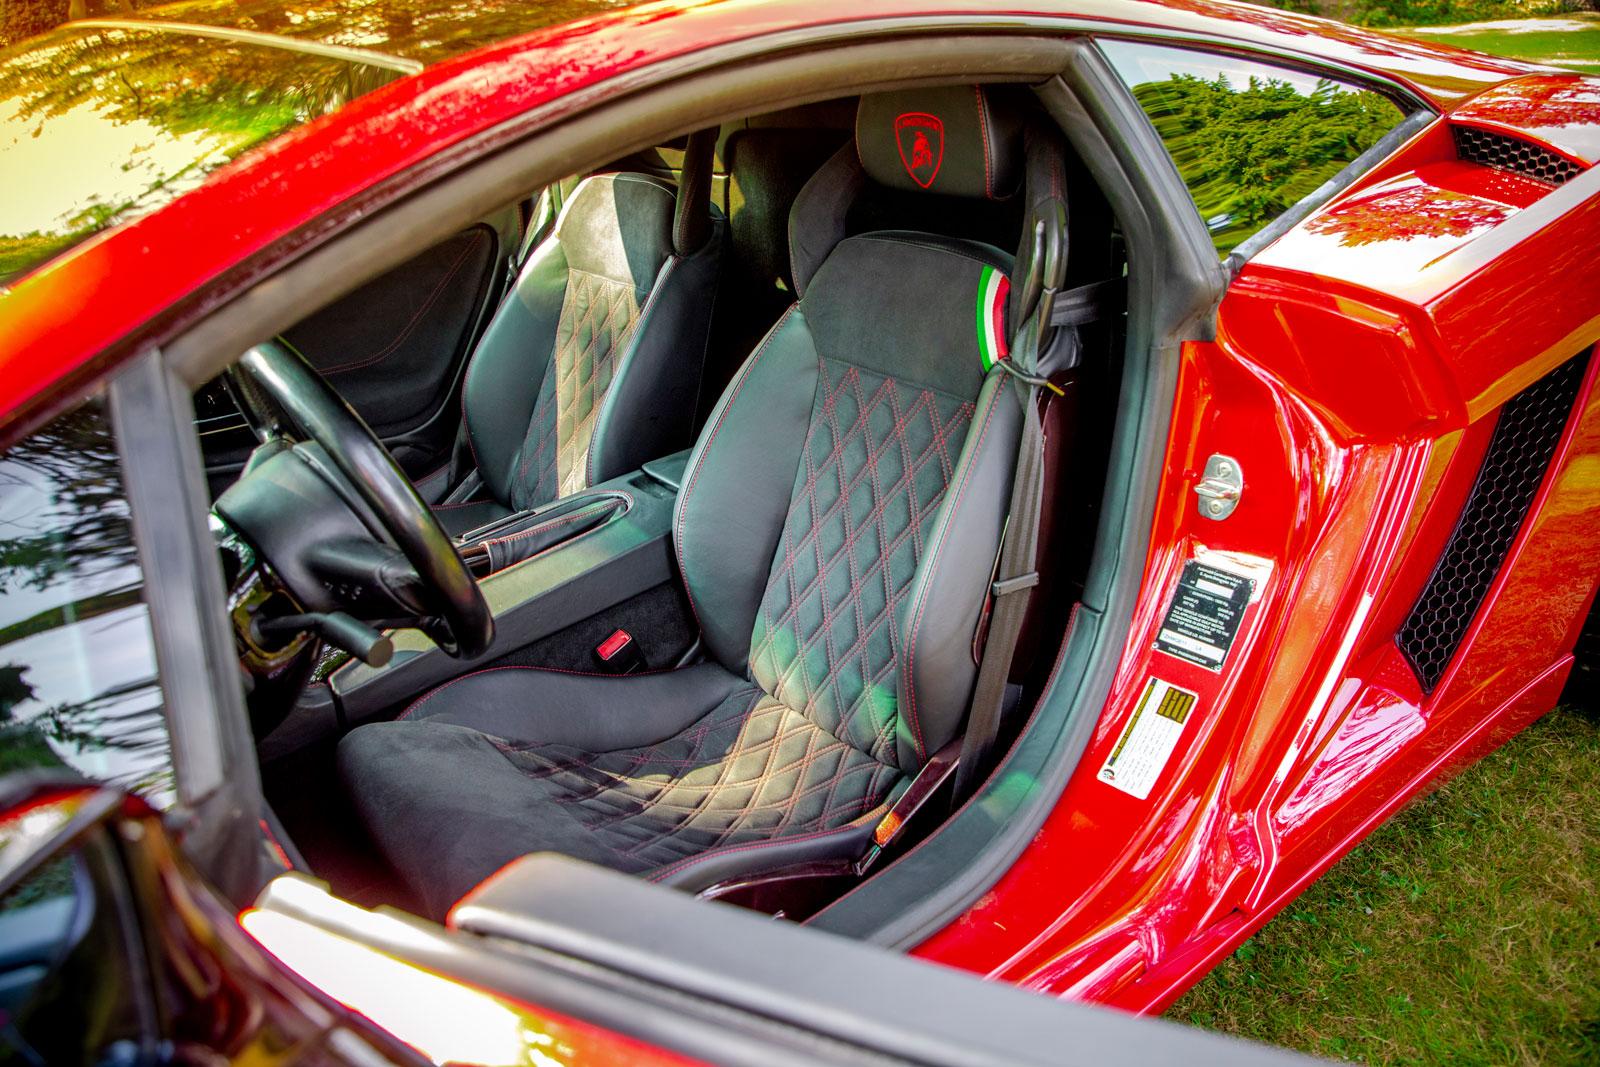 Fotografie Paderborn • DESIGN 7 • Outdoor • Lamborghini Gallardo • Sitze • Werbeagentur Paderborn